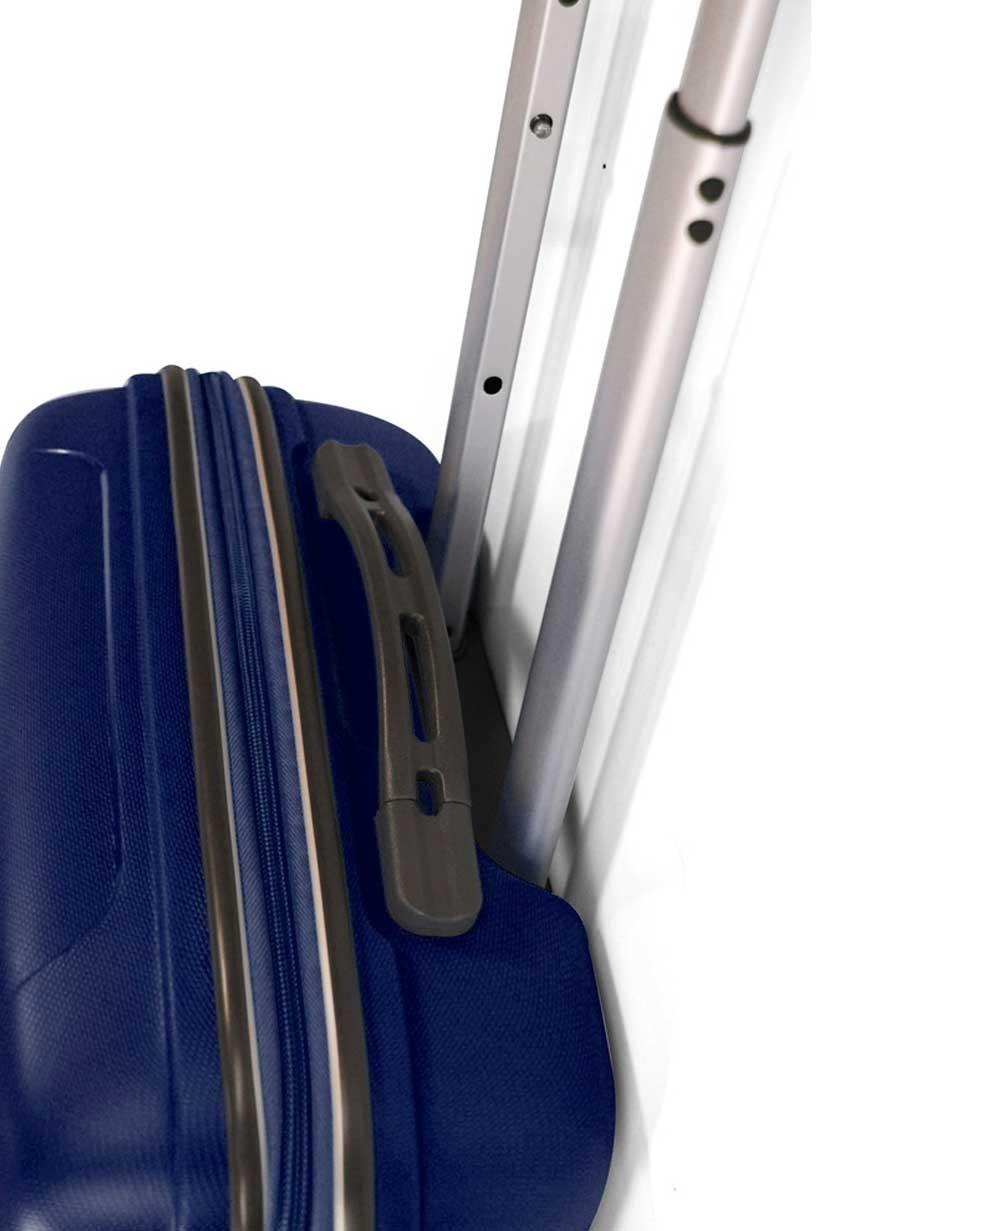 bc930bc3b Maleta mediana Roncato MODO Starlight 2.0 Azul Marino   Maletia.com